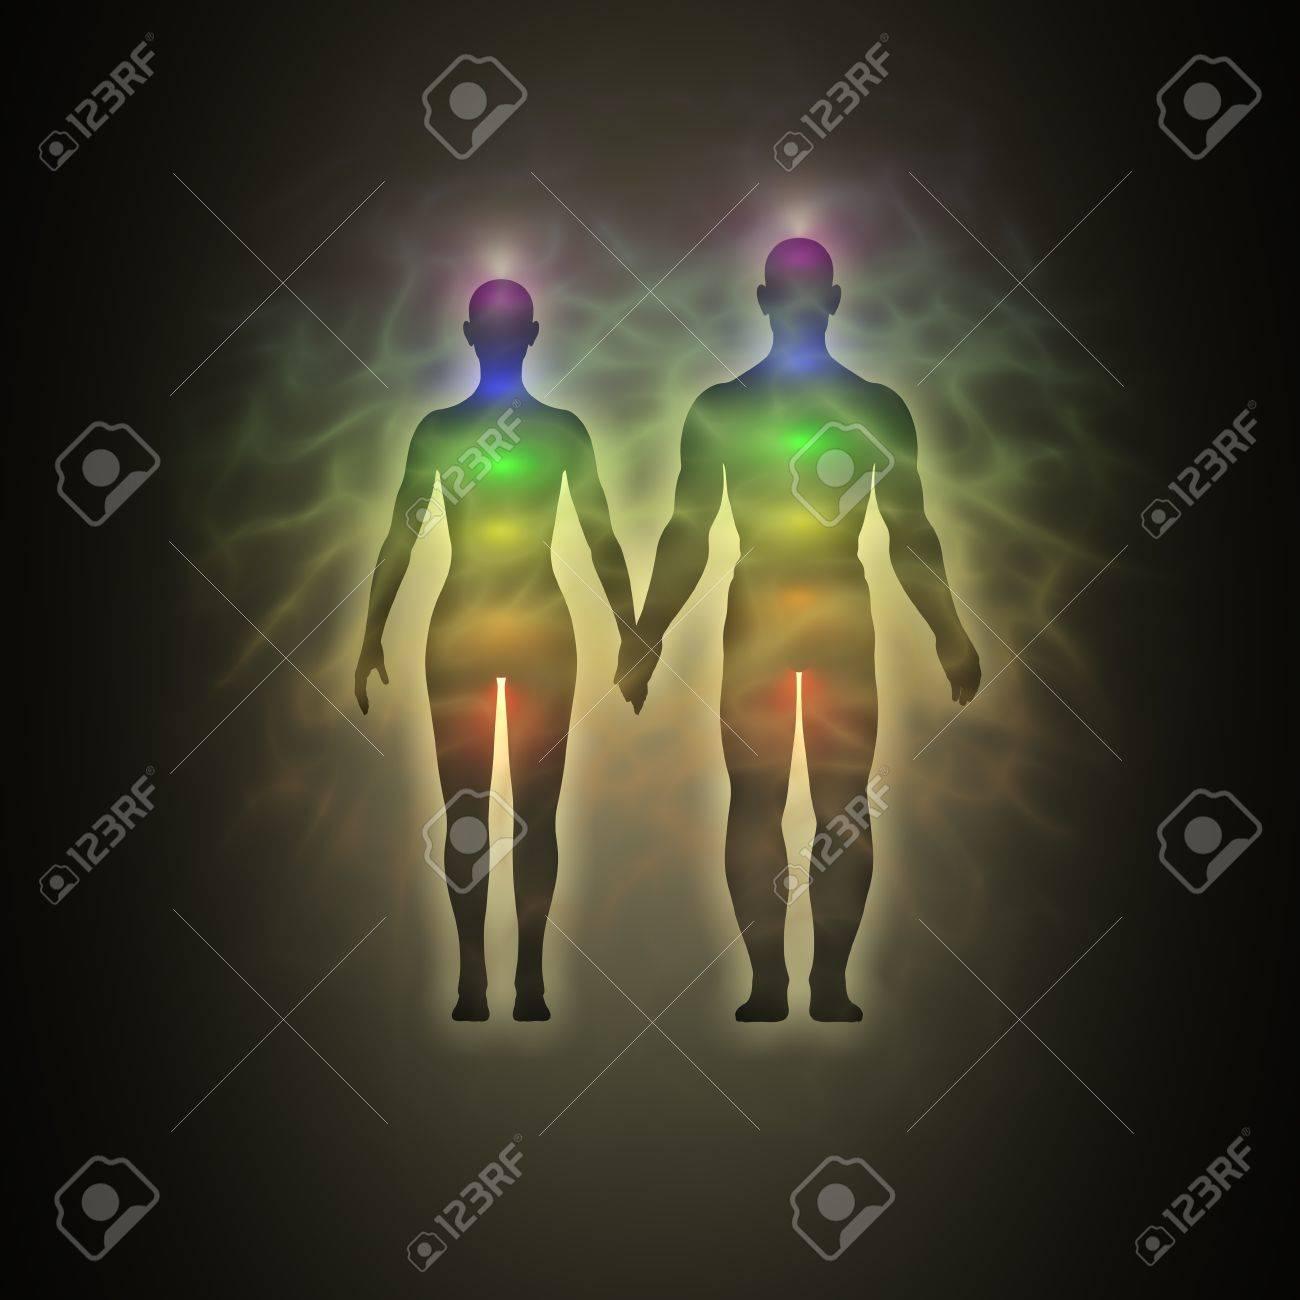 Woman and man energy body, aura, chakras, energy, silhouette Stock Photo - 12295445